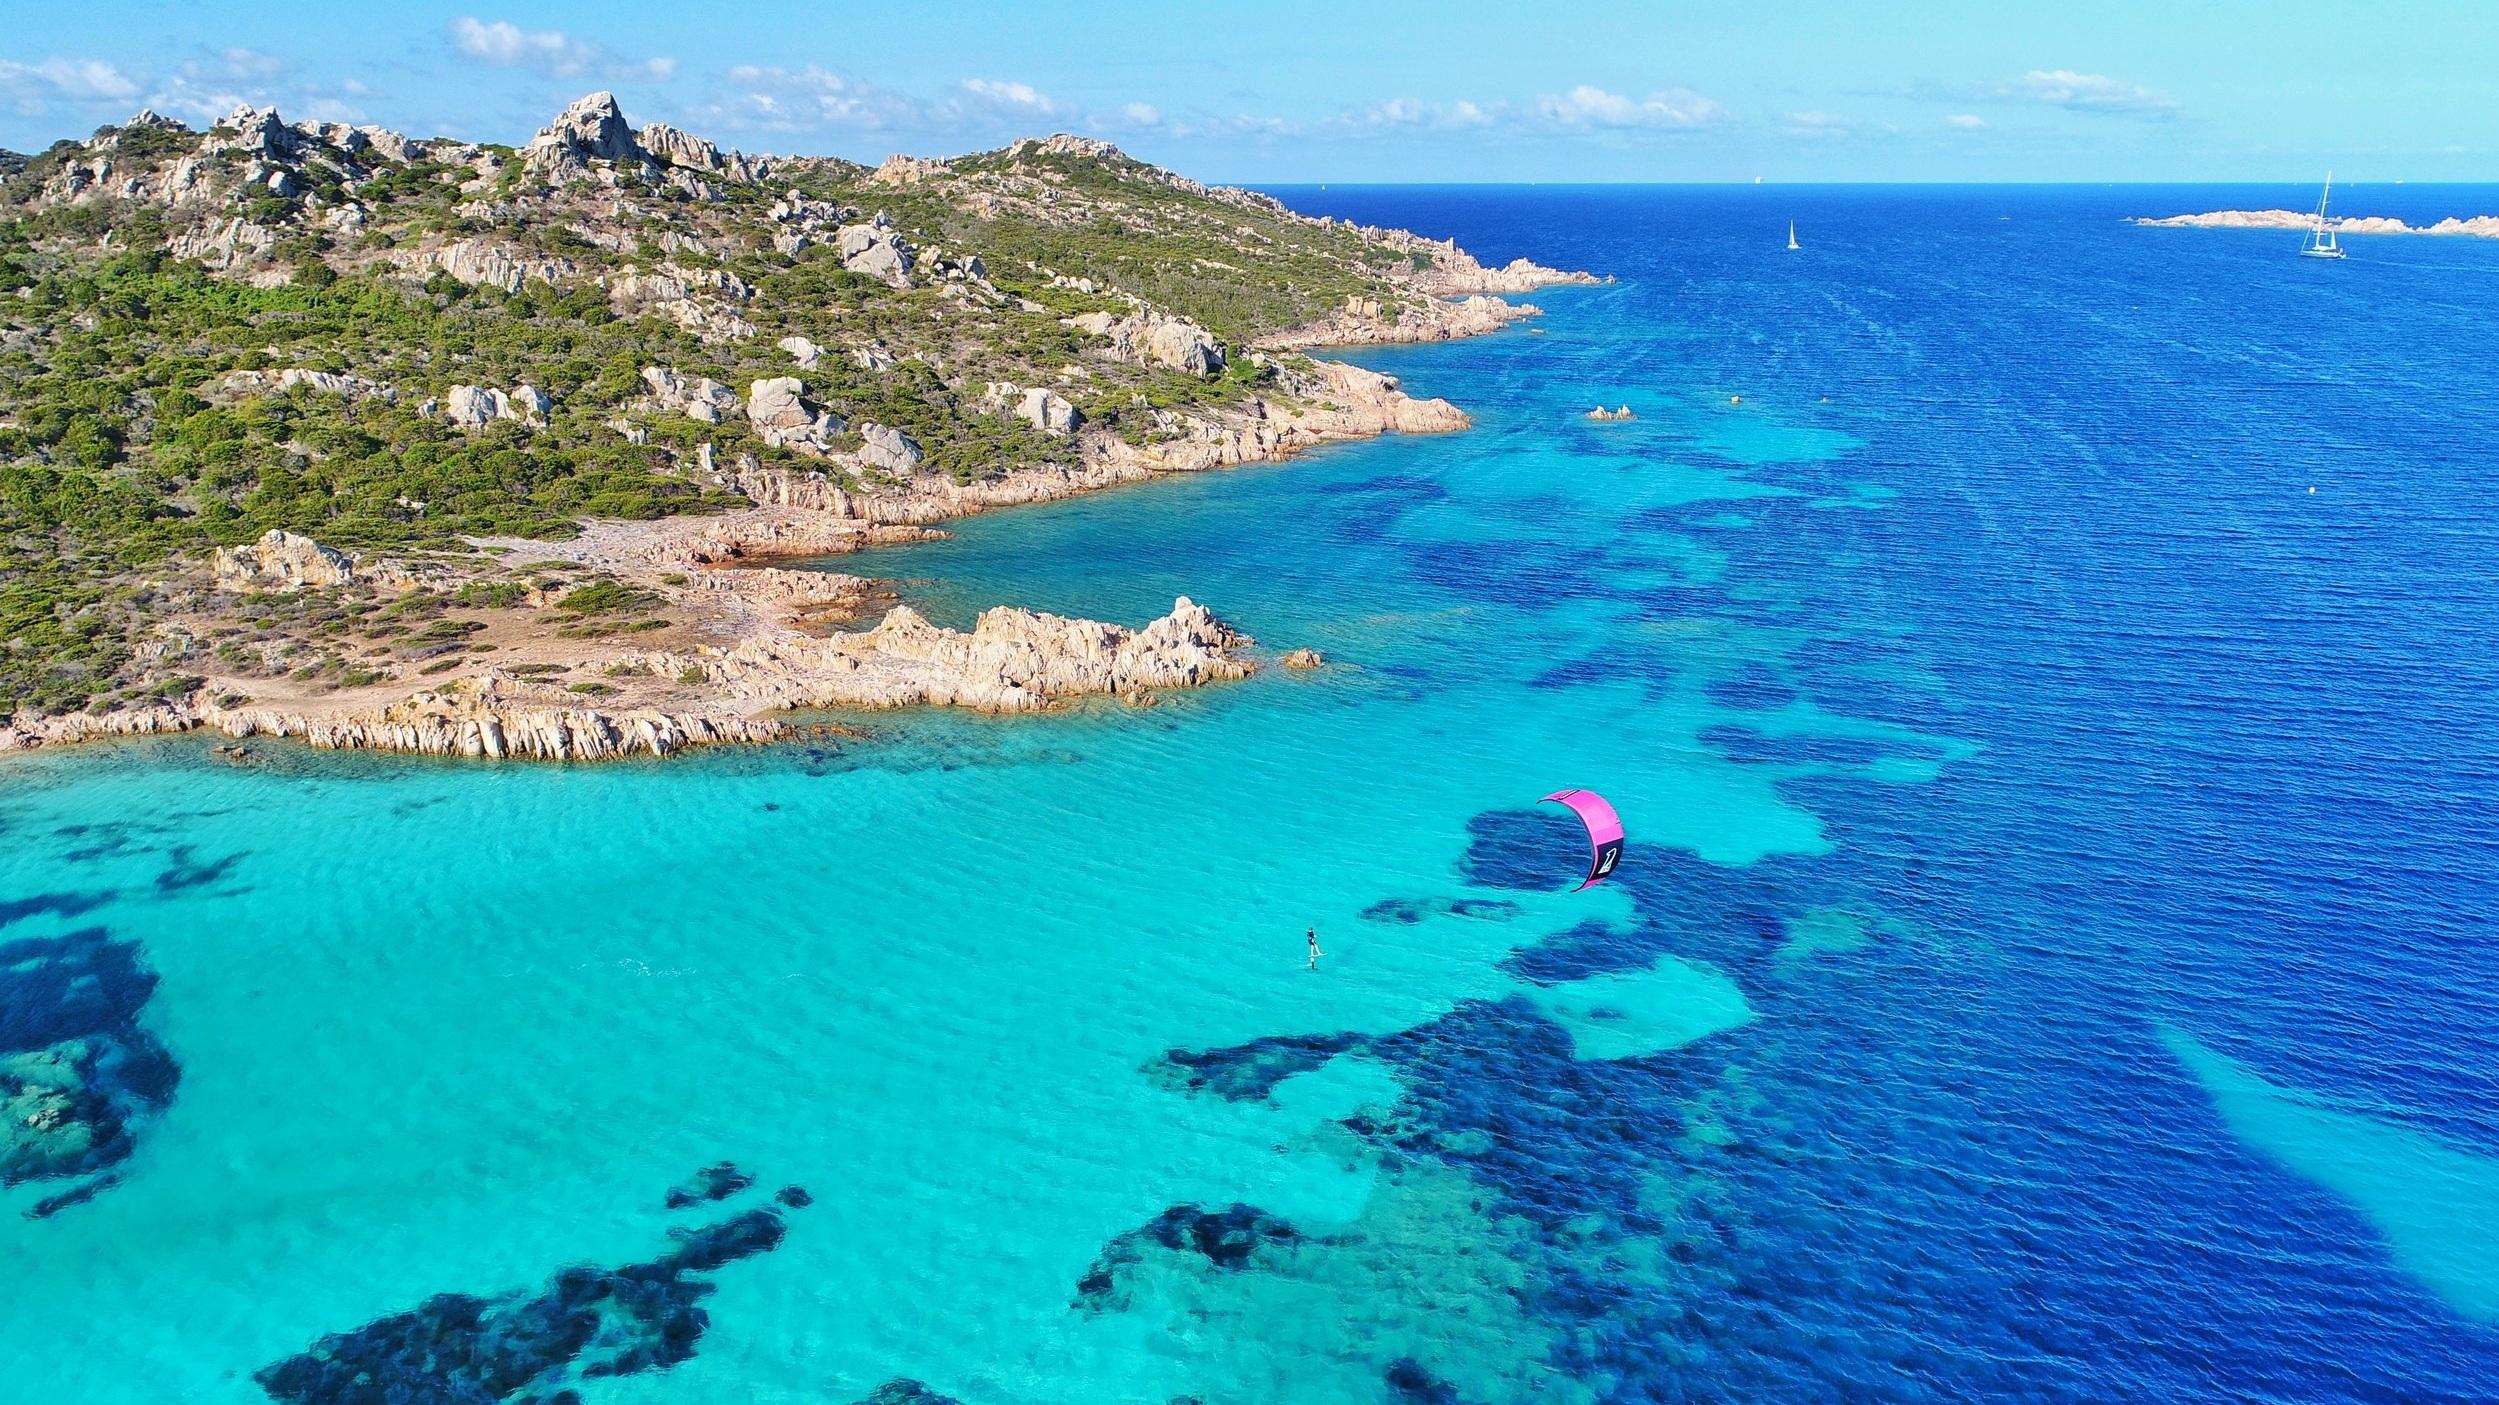 Sardinia1%2BThe%2BAction%2BCruise.jpg